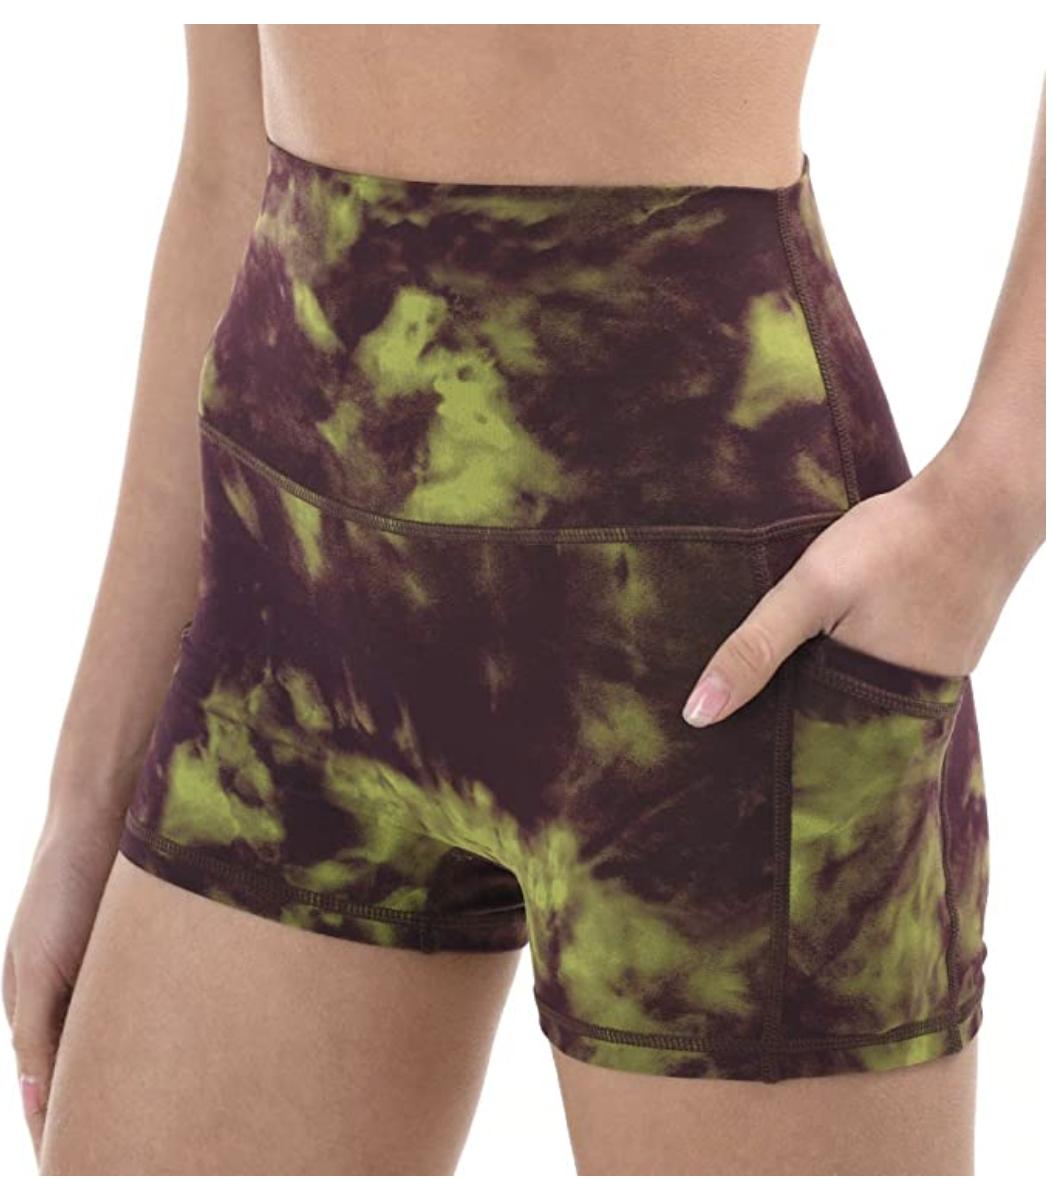 tie-dye running shorts